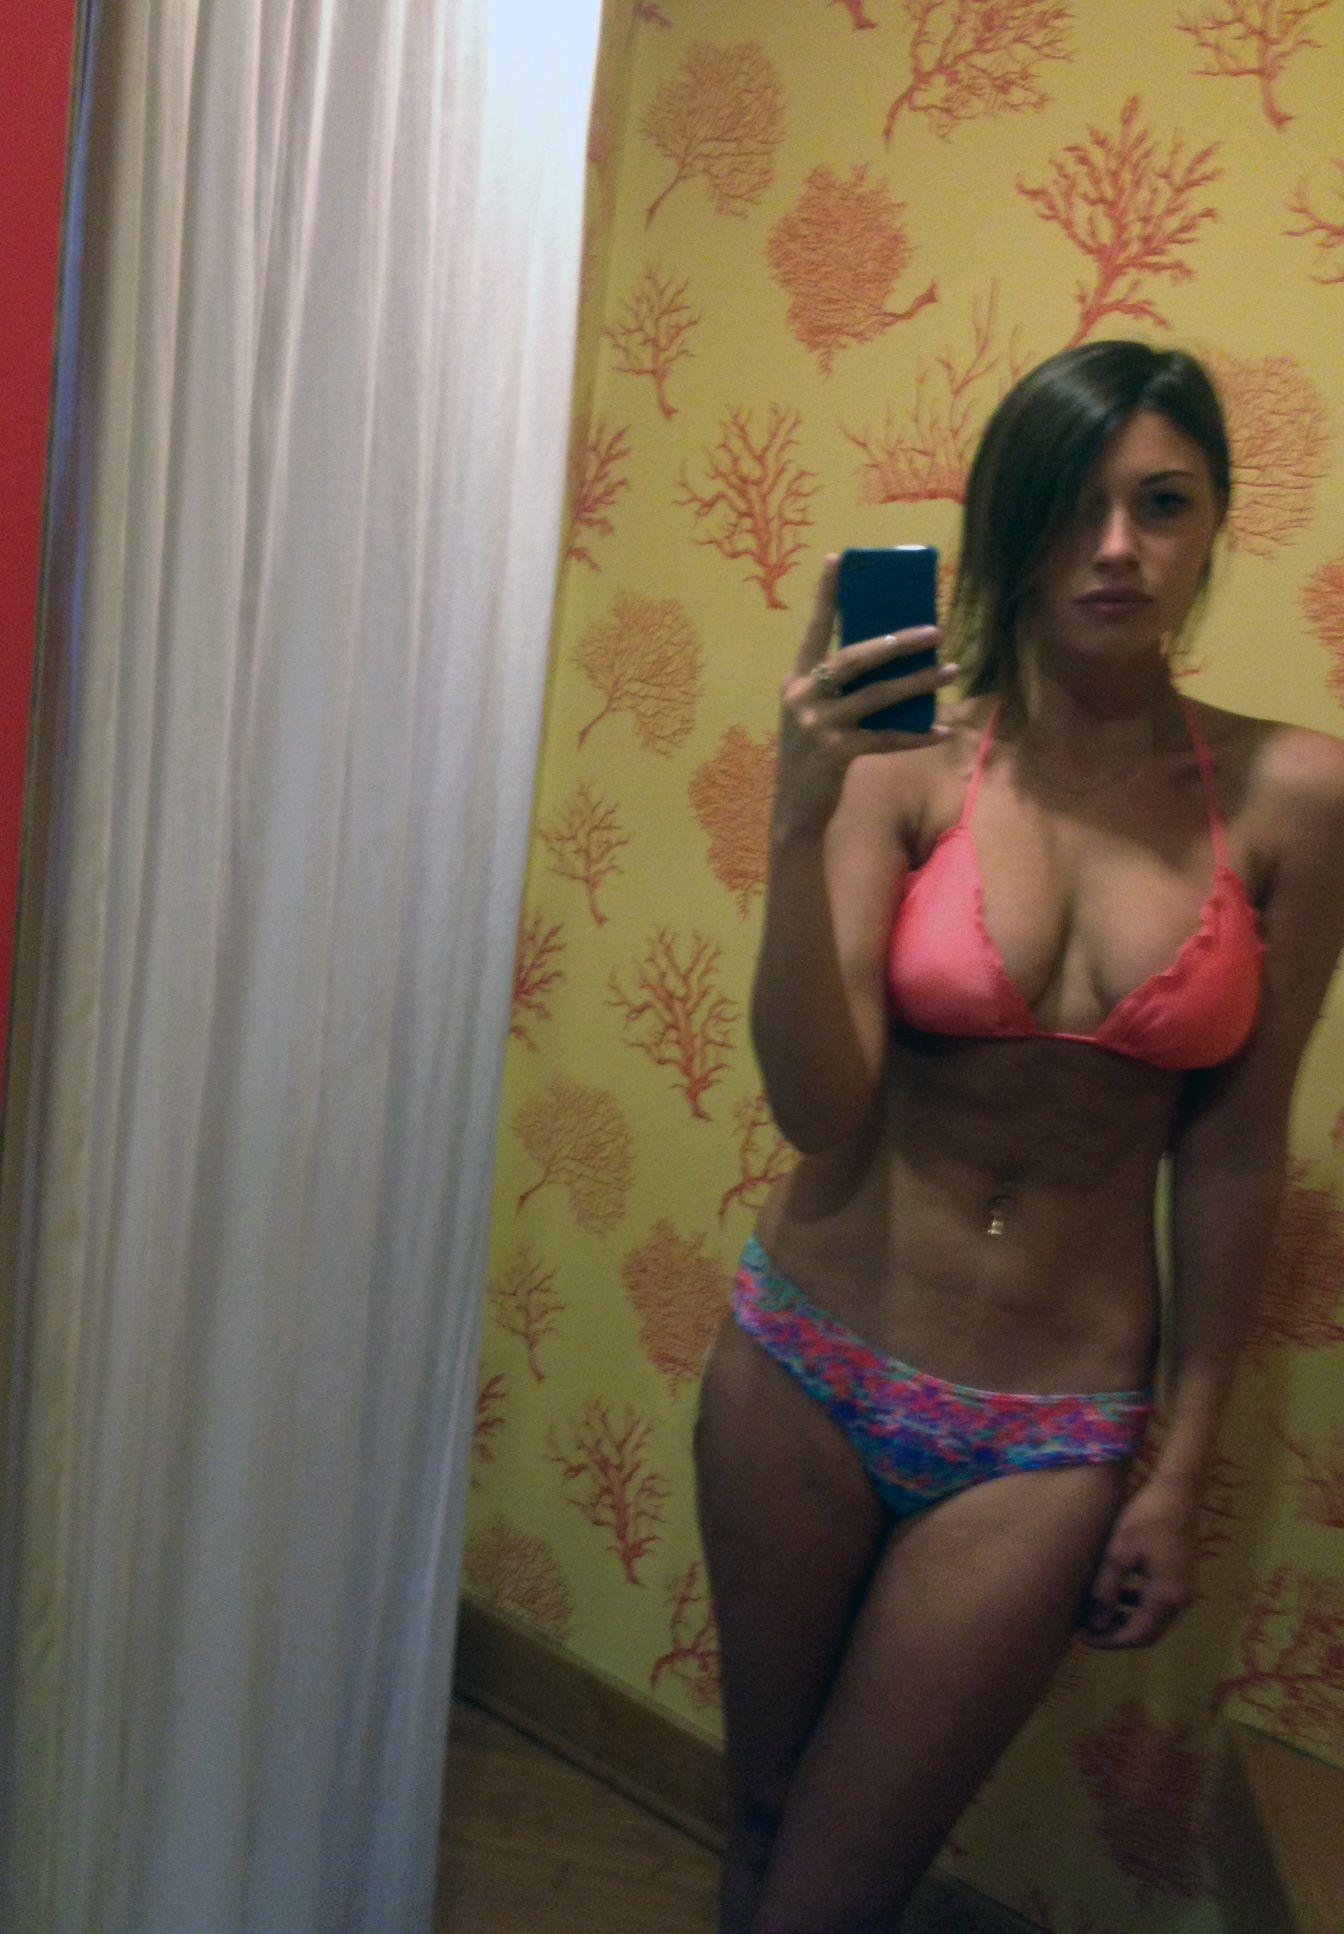 Men nude lockeroom pics candid shower